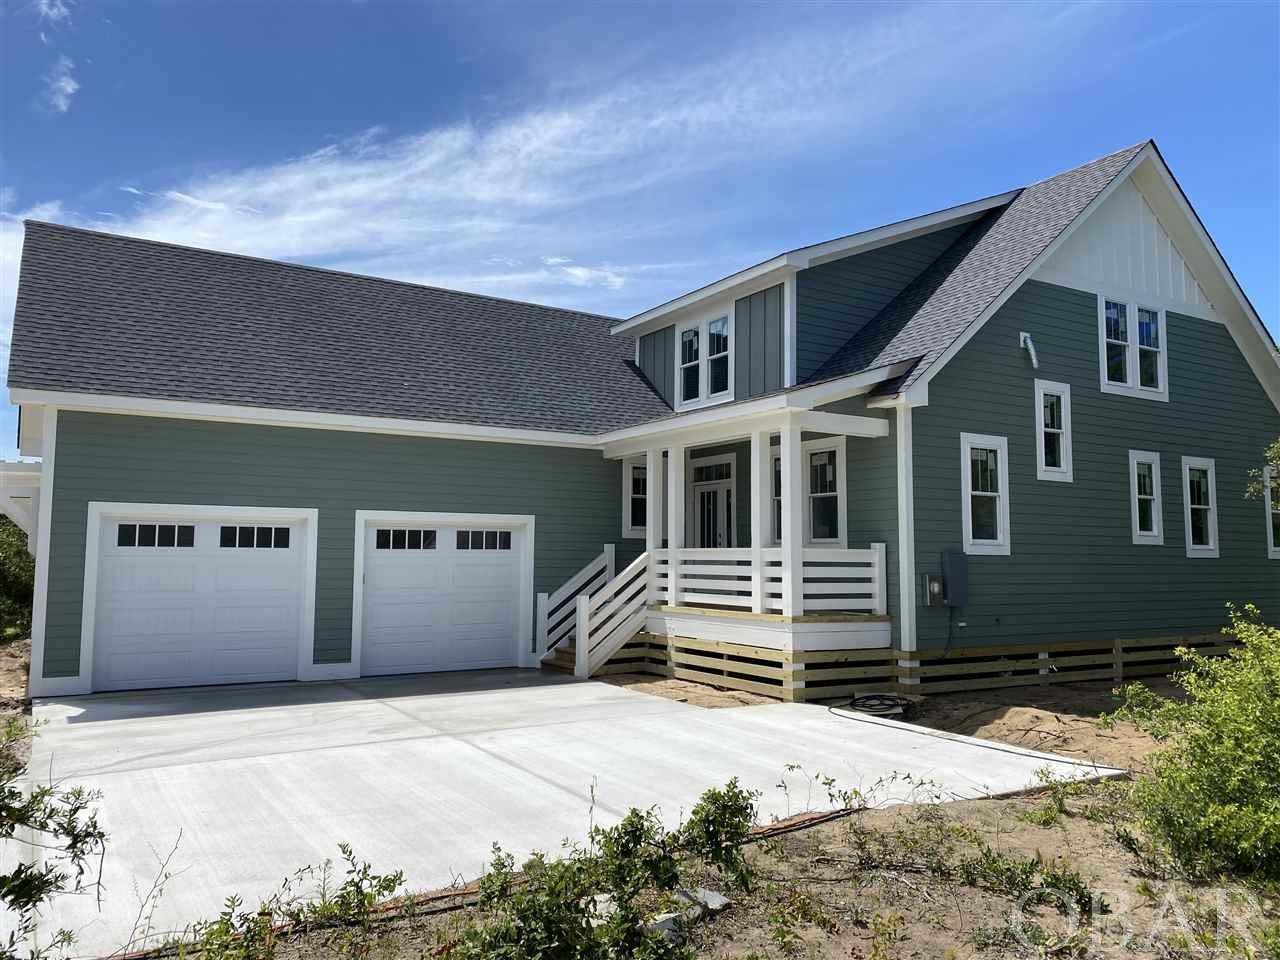 157 B Wax Myrtle Trail Lot B, Southern Shores, NC 27949